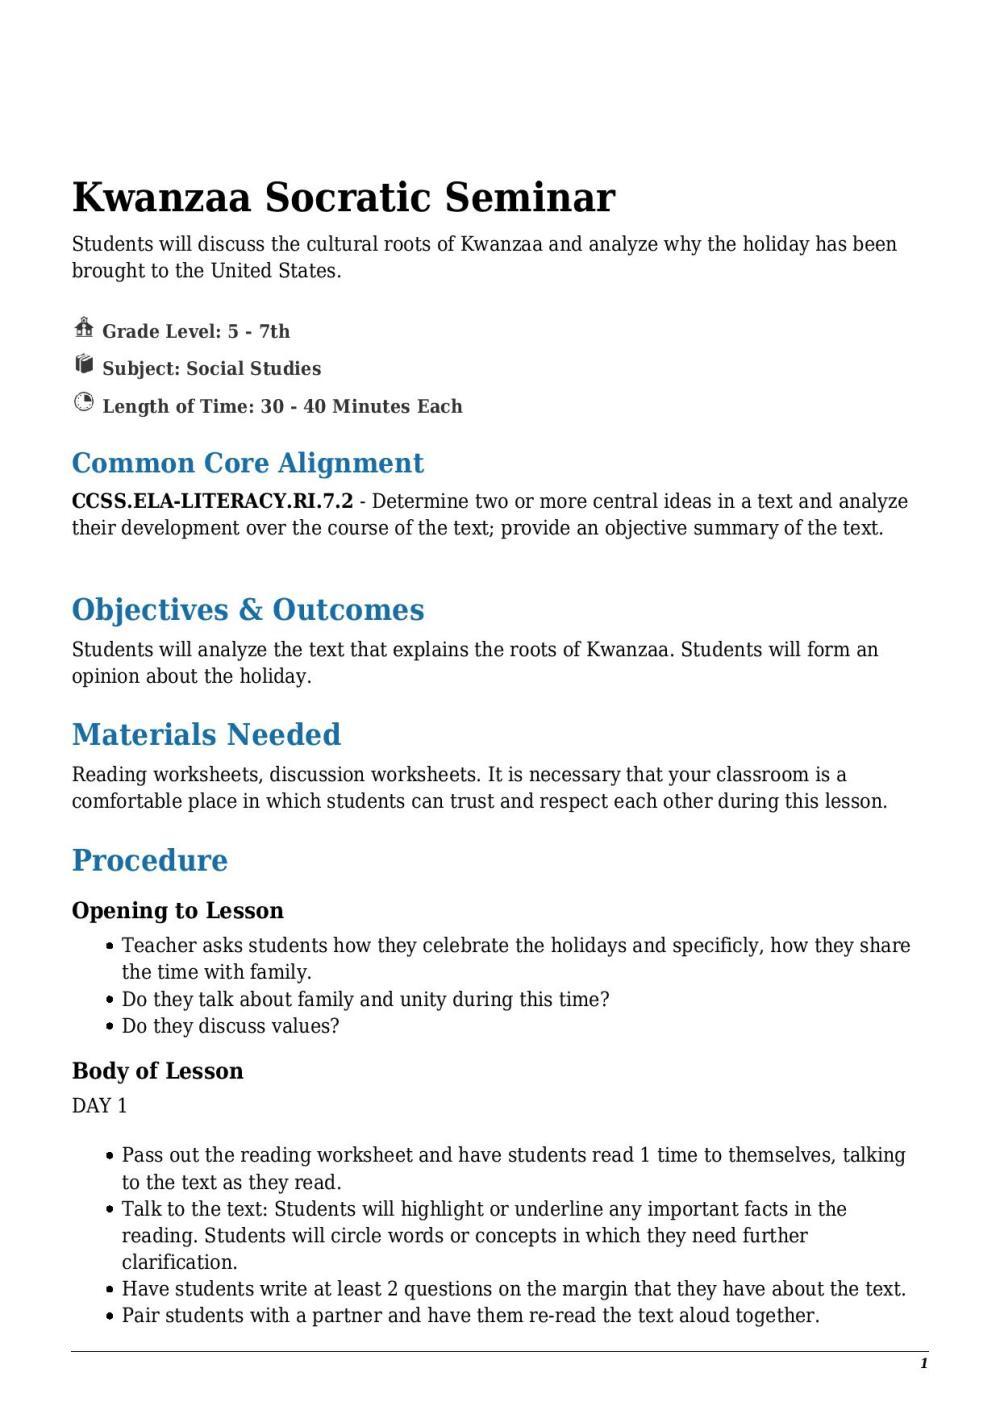 medium resolution of Kwanzaa Socratic Seminar Grade 5 - 7th - Lesson Tutor